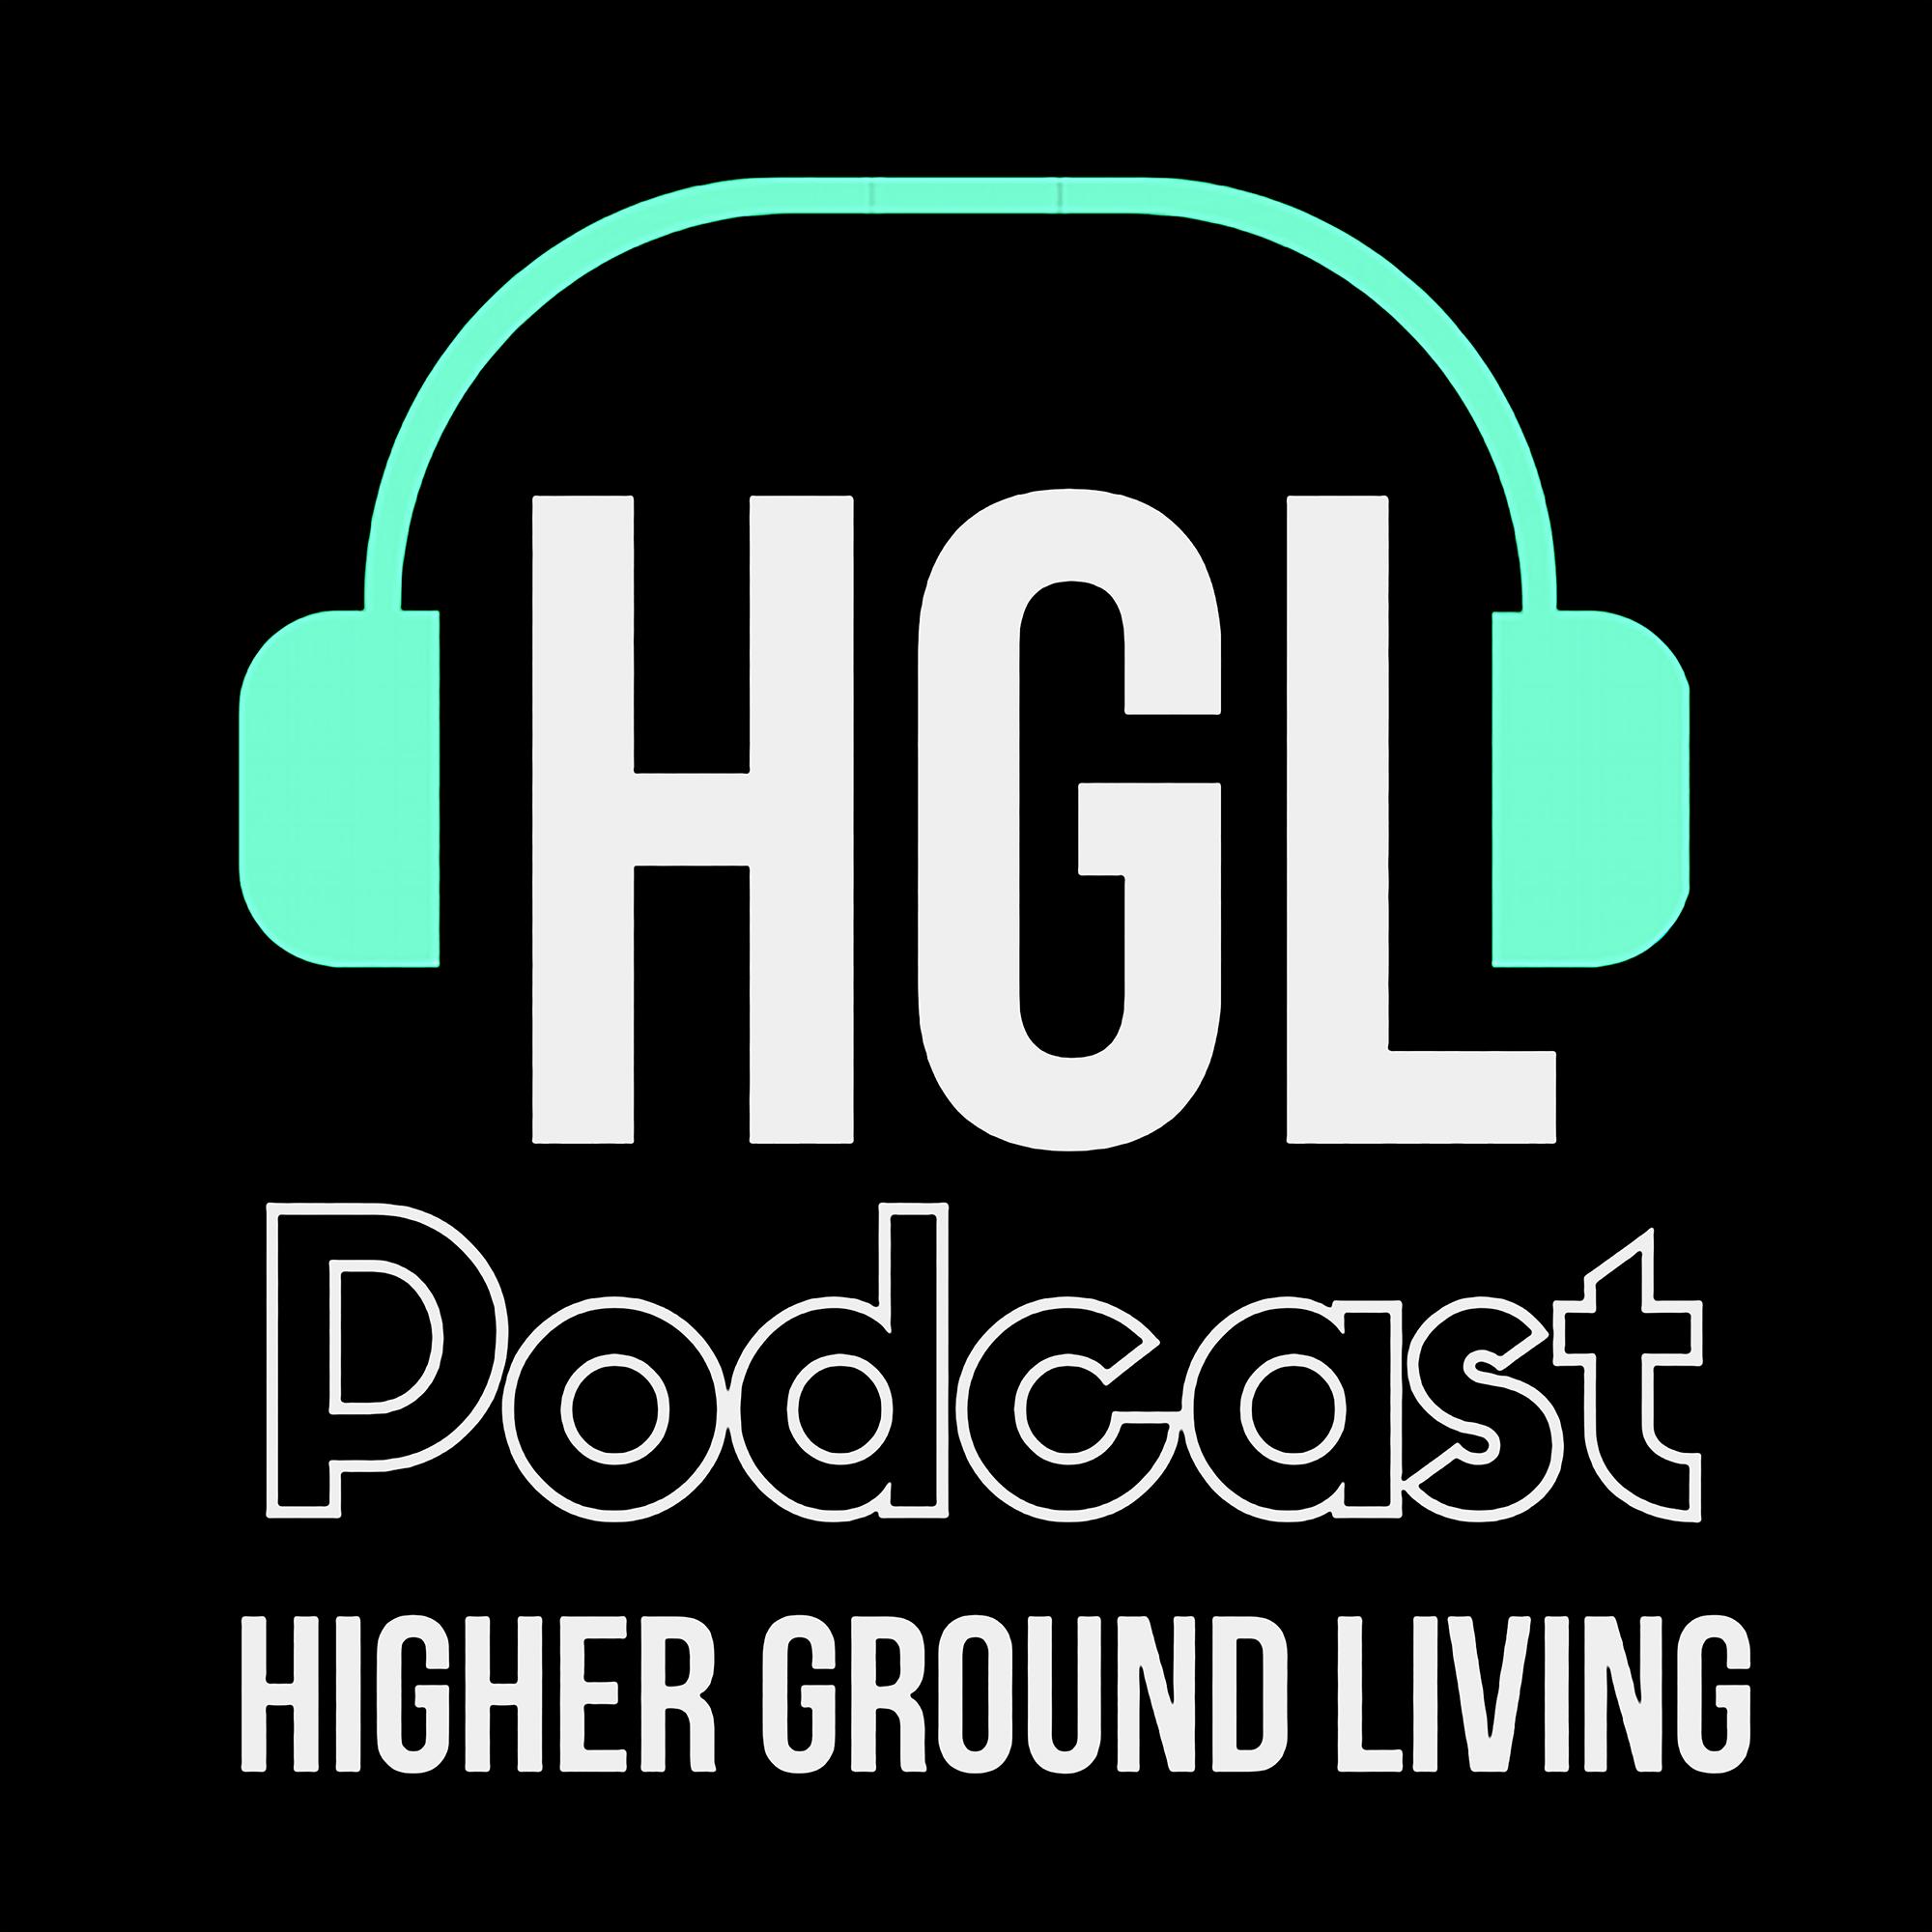 Higher Ground Living Podcast show art